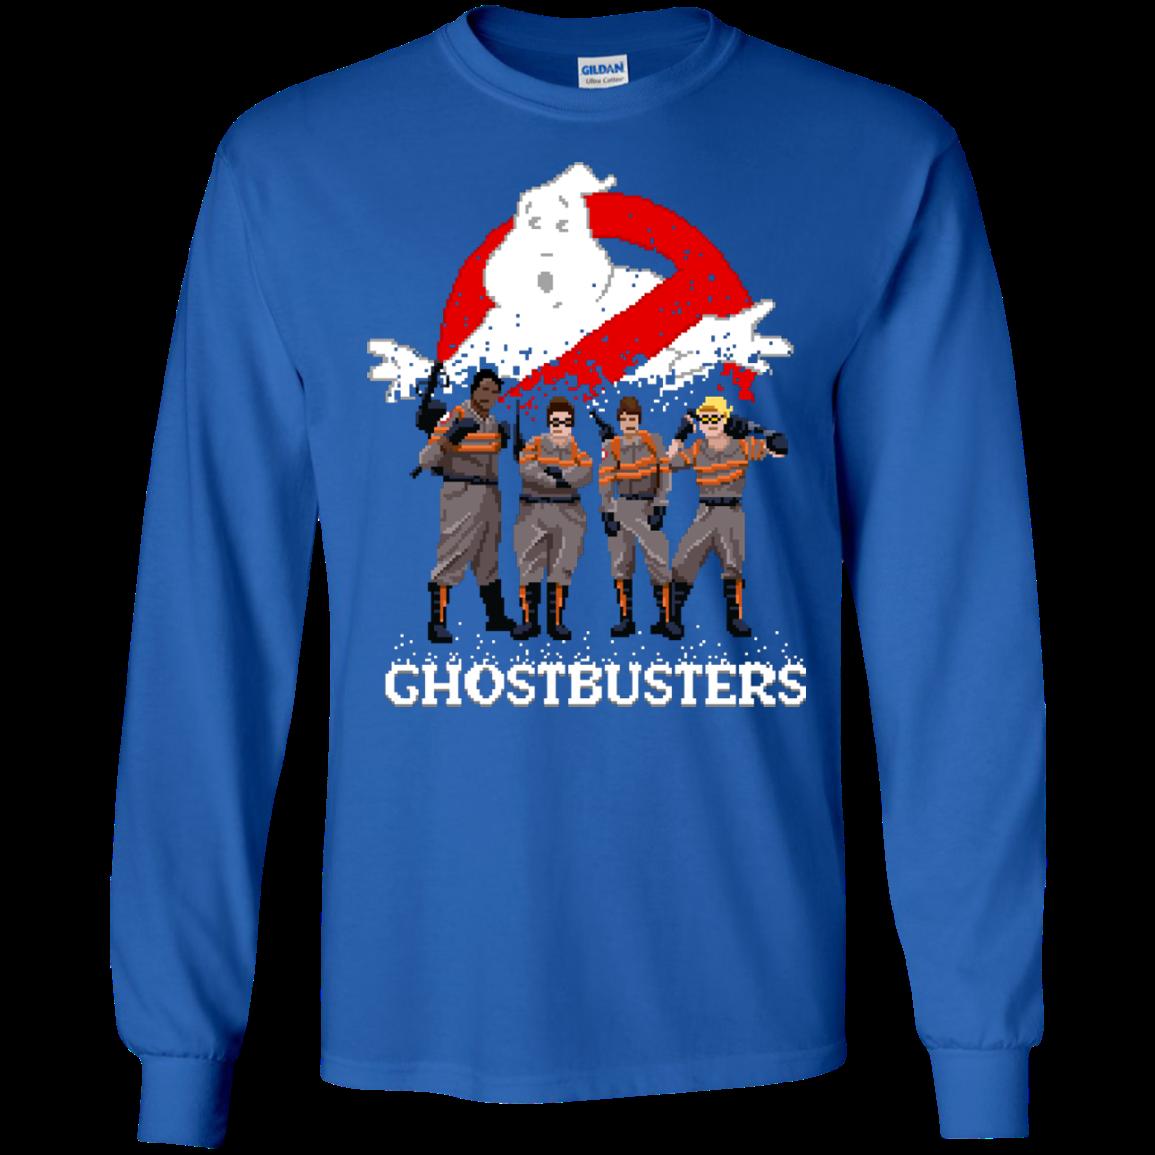 Ghostbuster 2016 Long Sleeves Tshirt